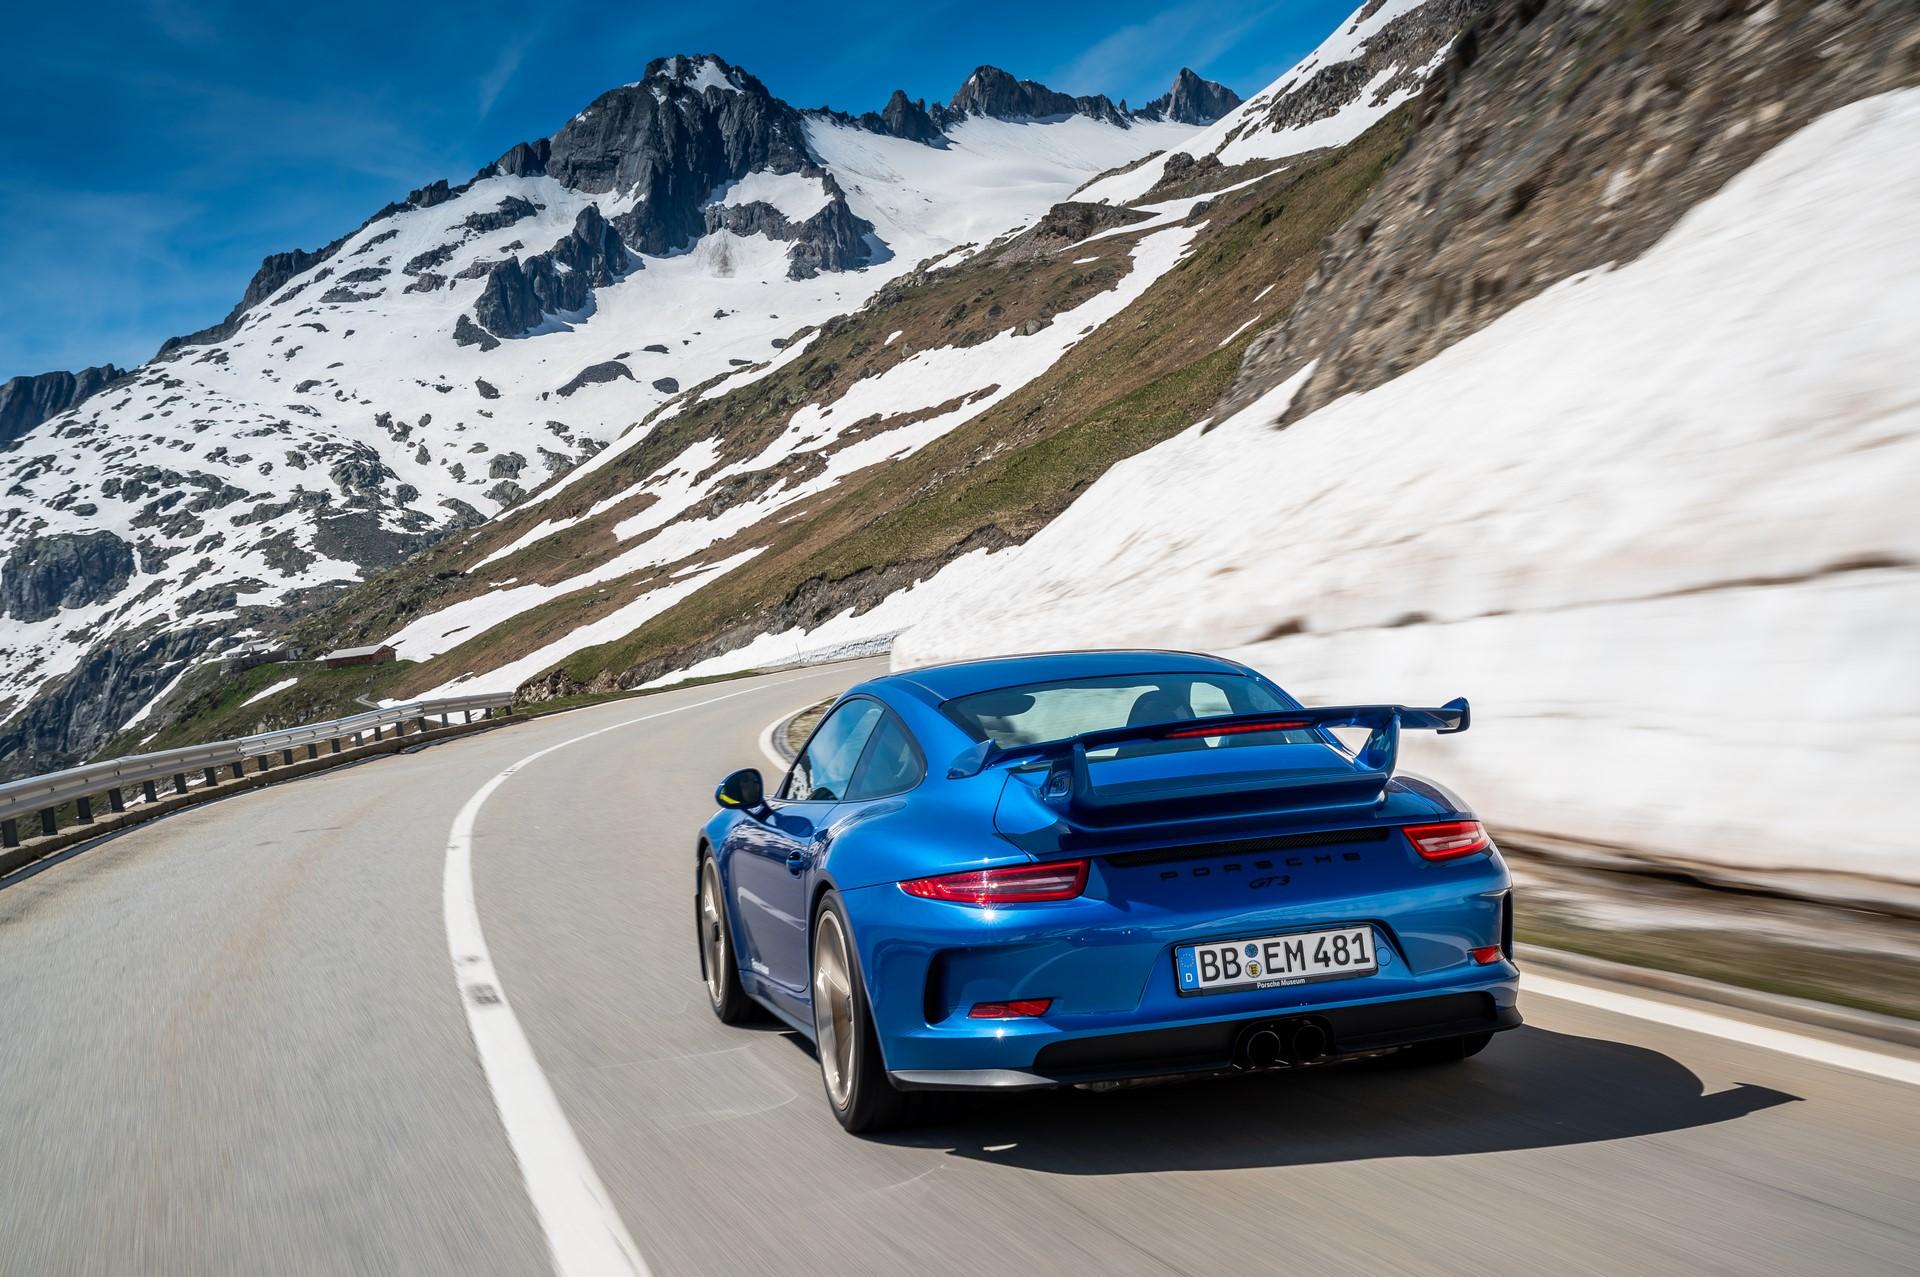 20-years-of-the-Porsche-911-GT3-42